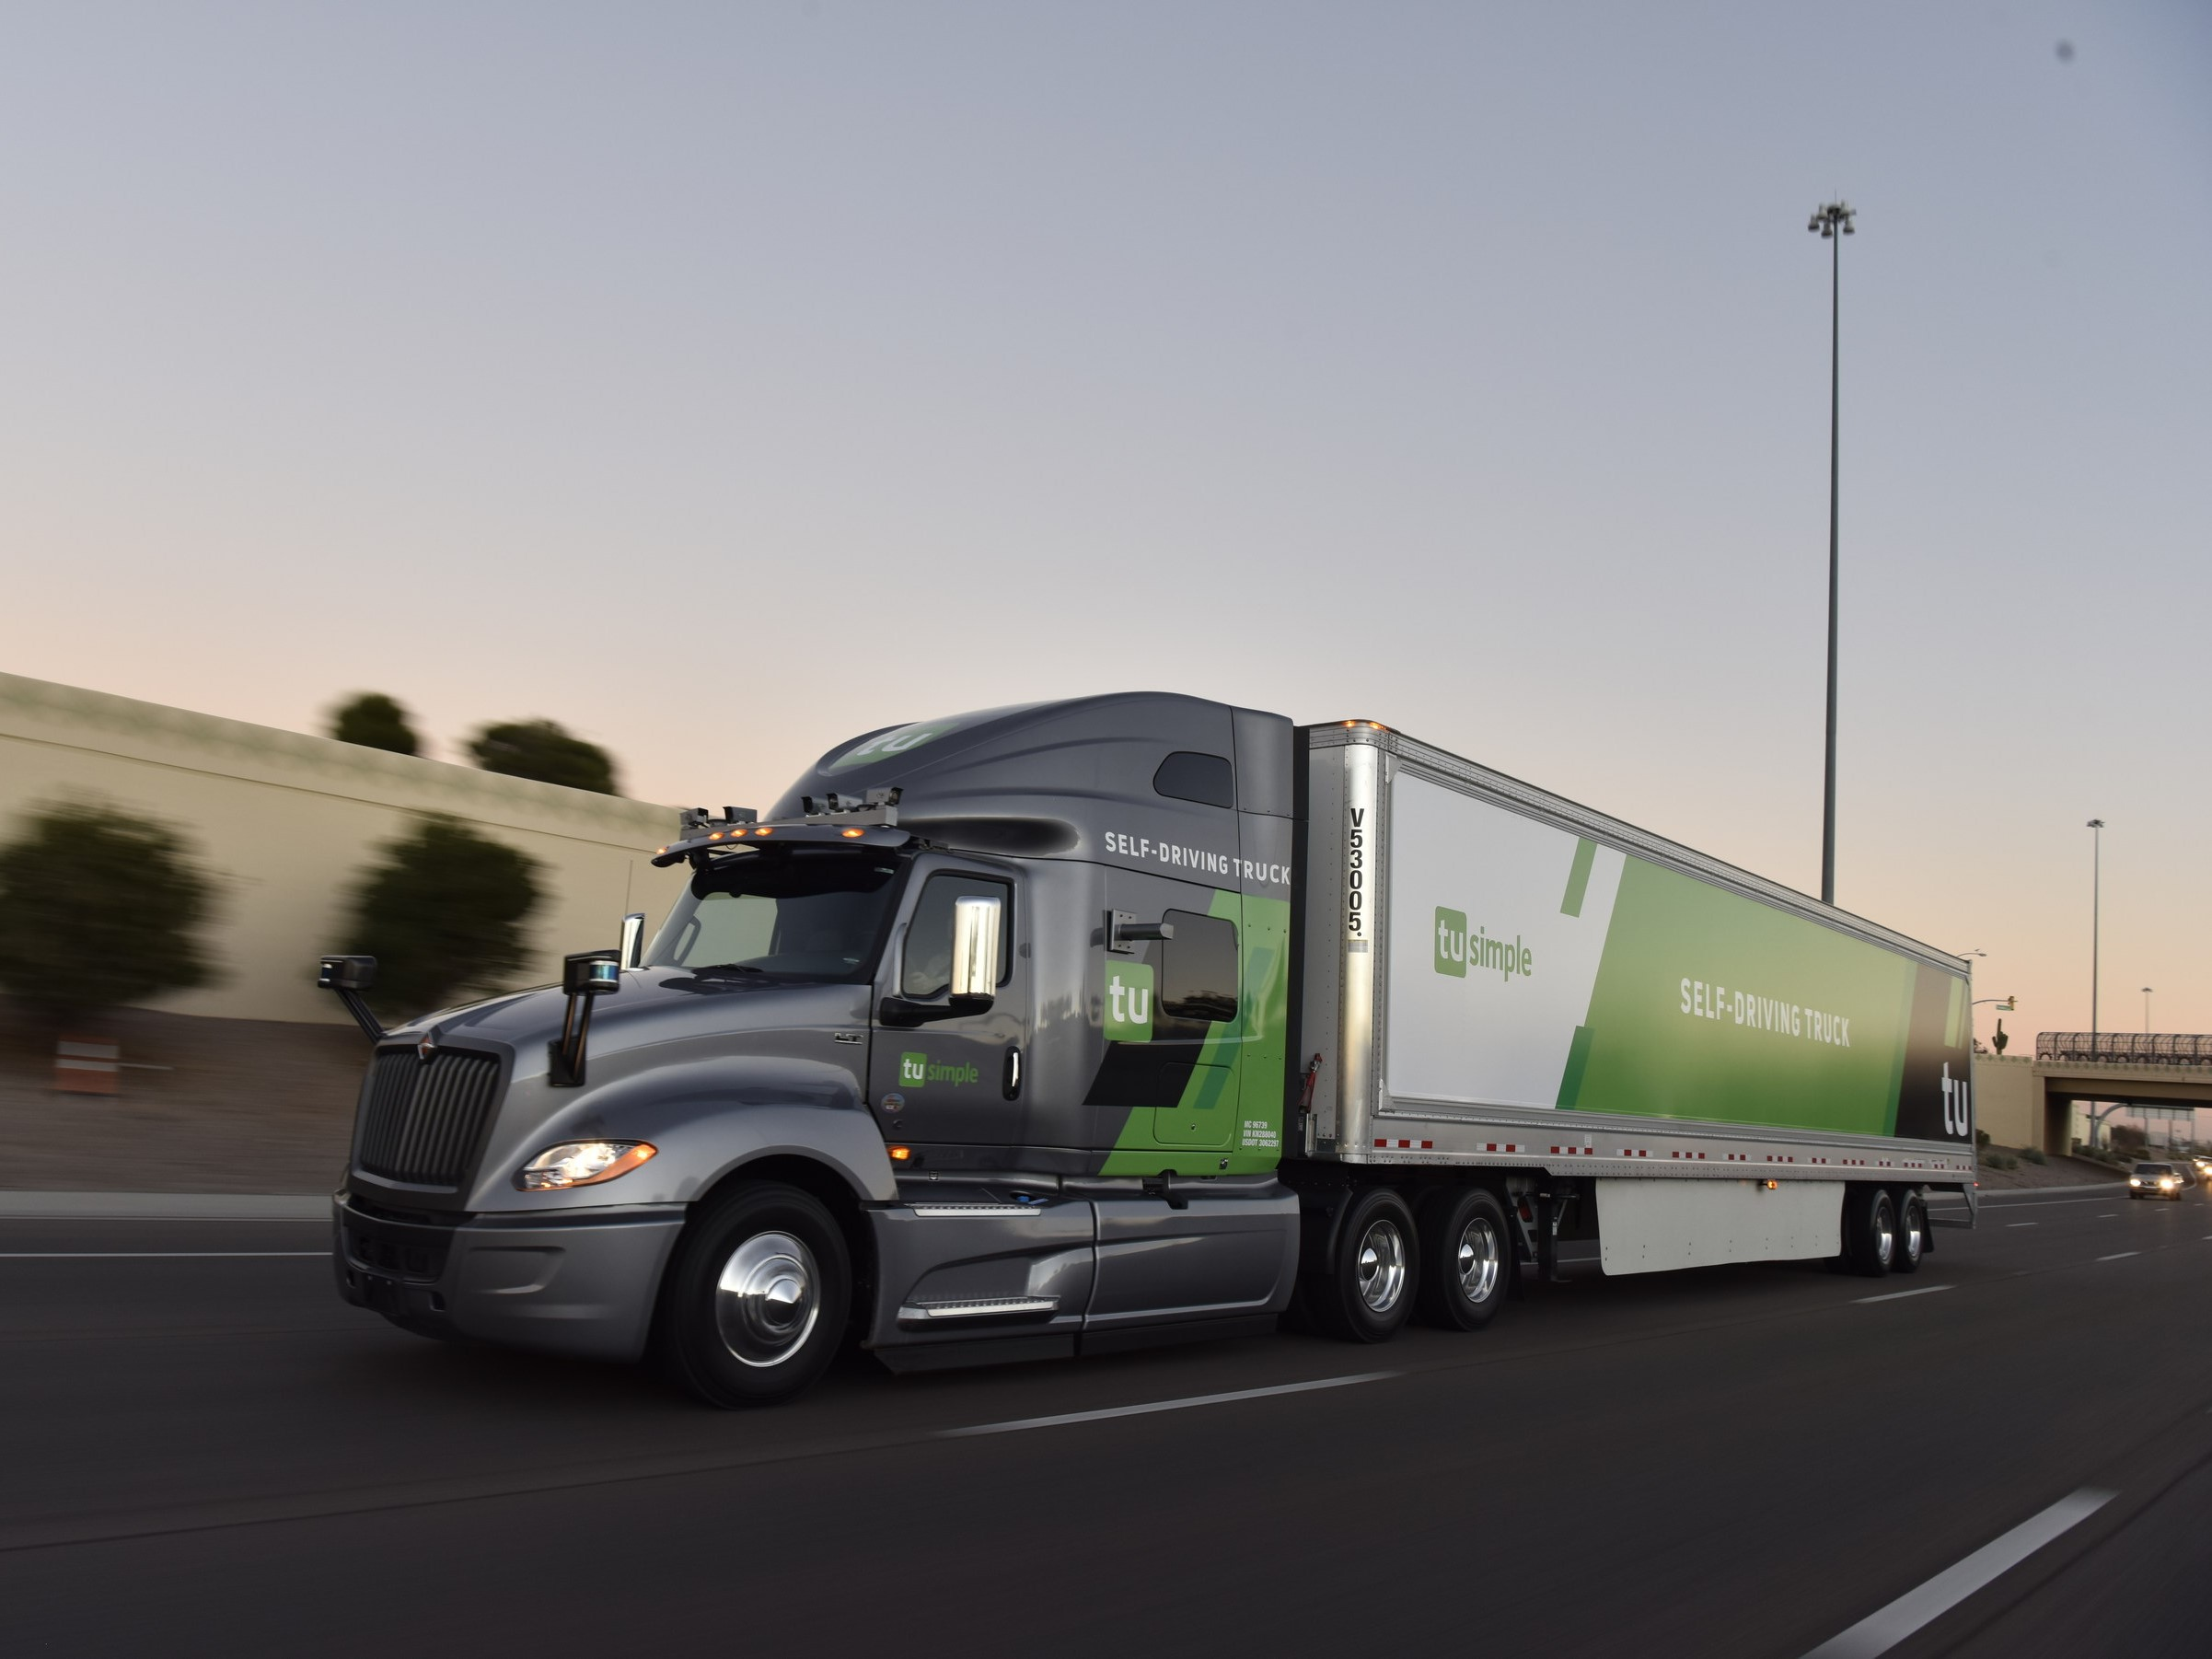 TuSimple's autonomous truck. PHOTO: Credit to TuSimple